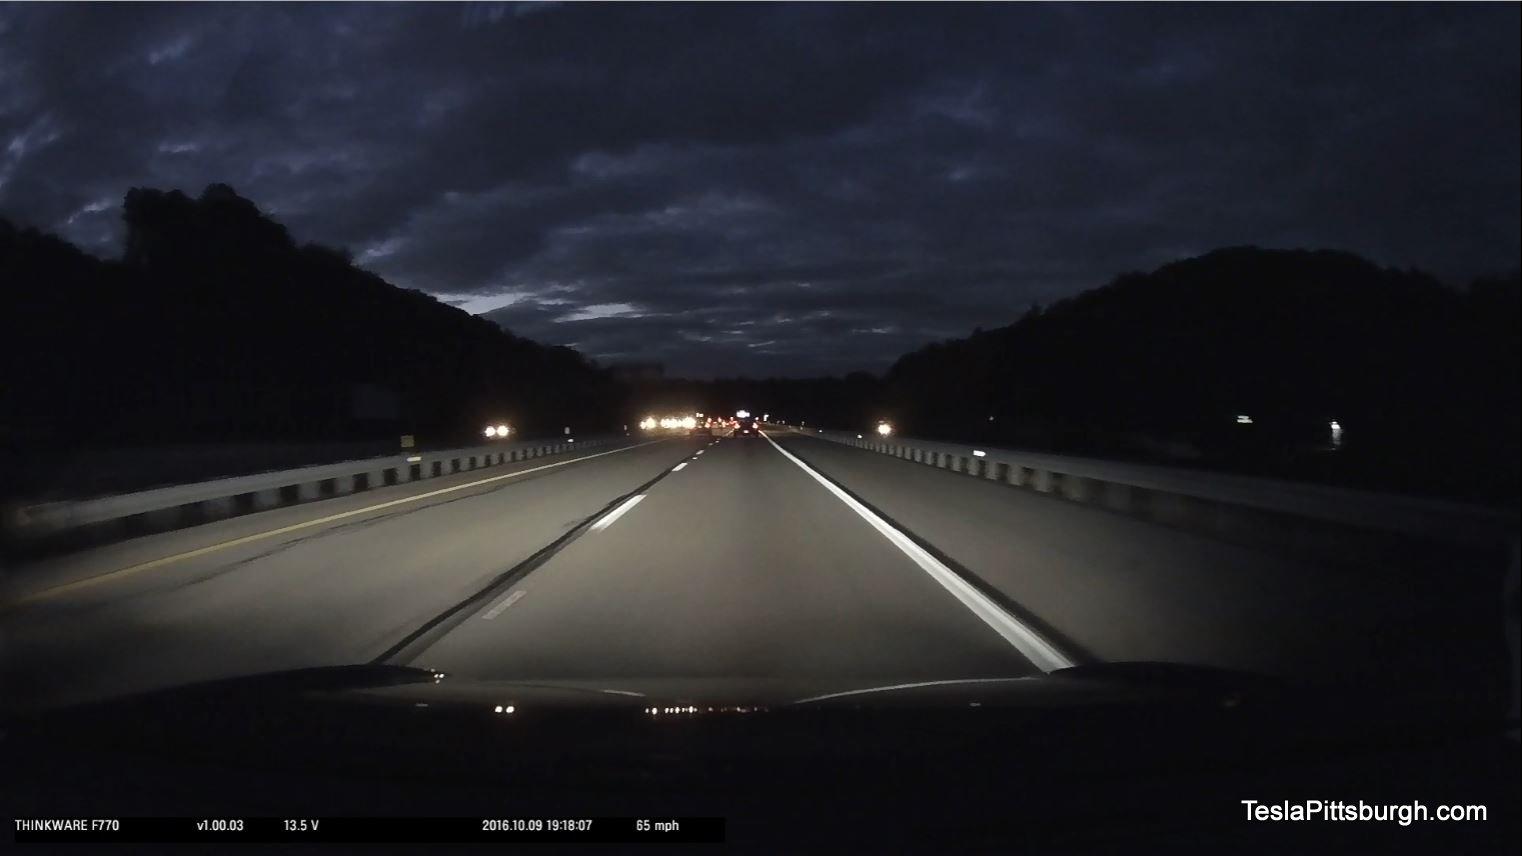 tesla-pittsburgh-dashcam-review-thinkware-f770-camera-279-night-straight